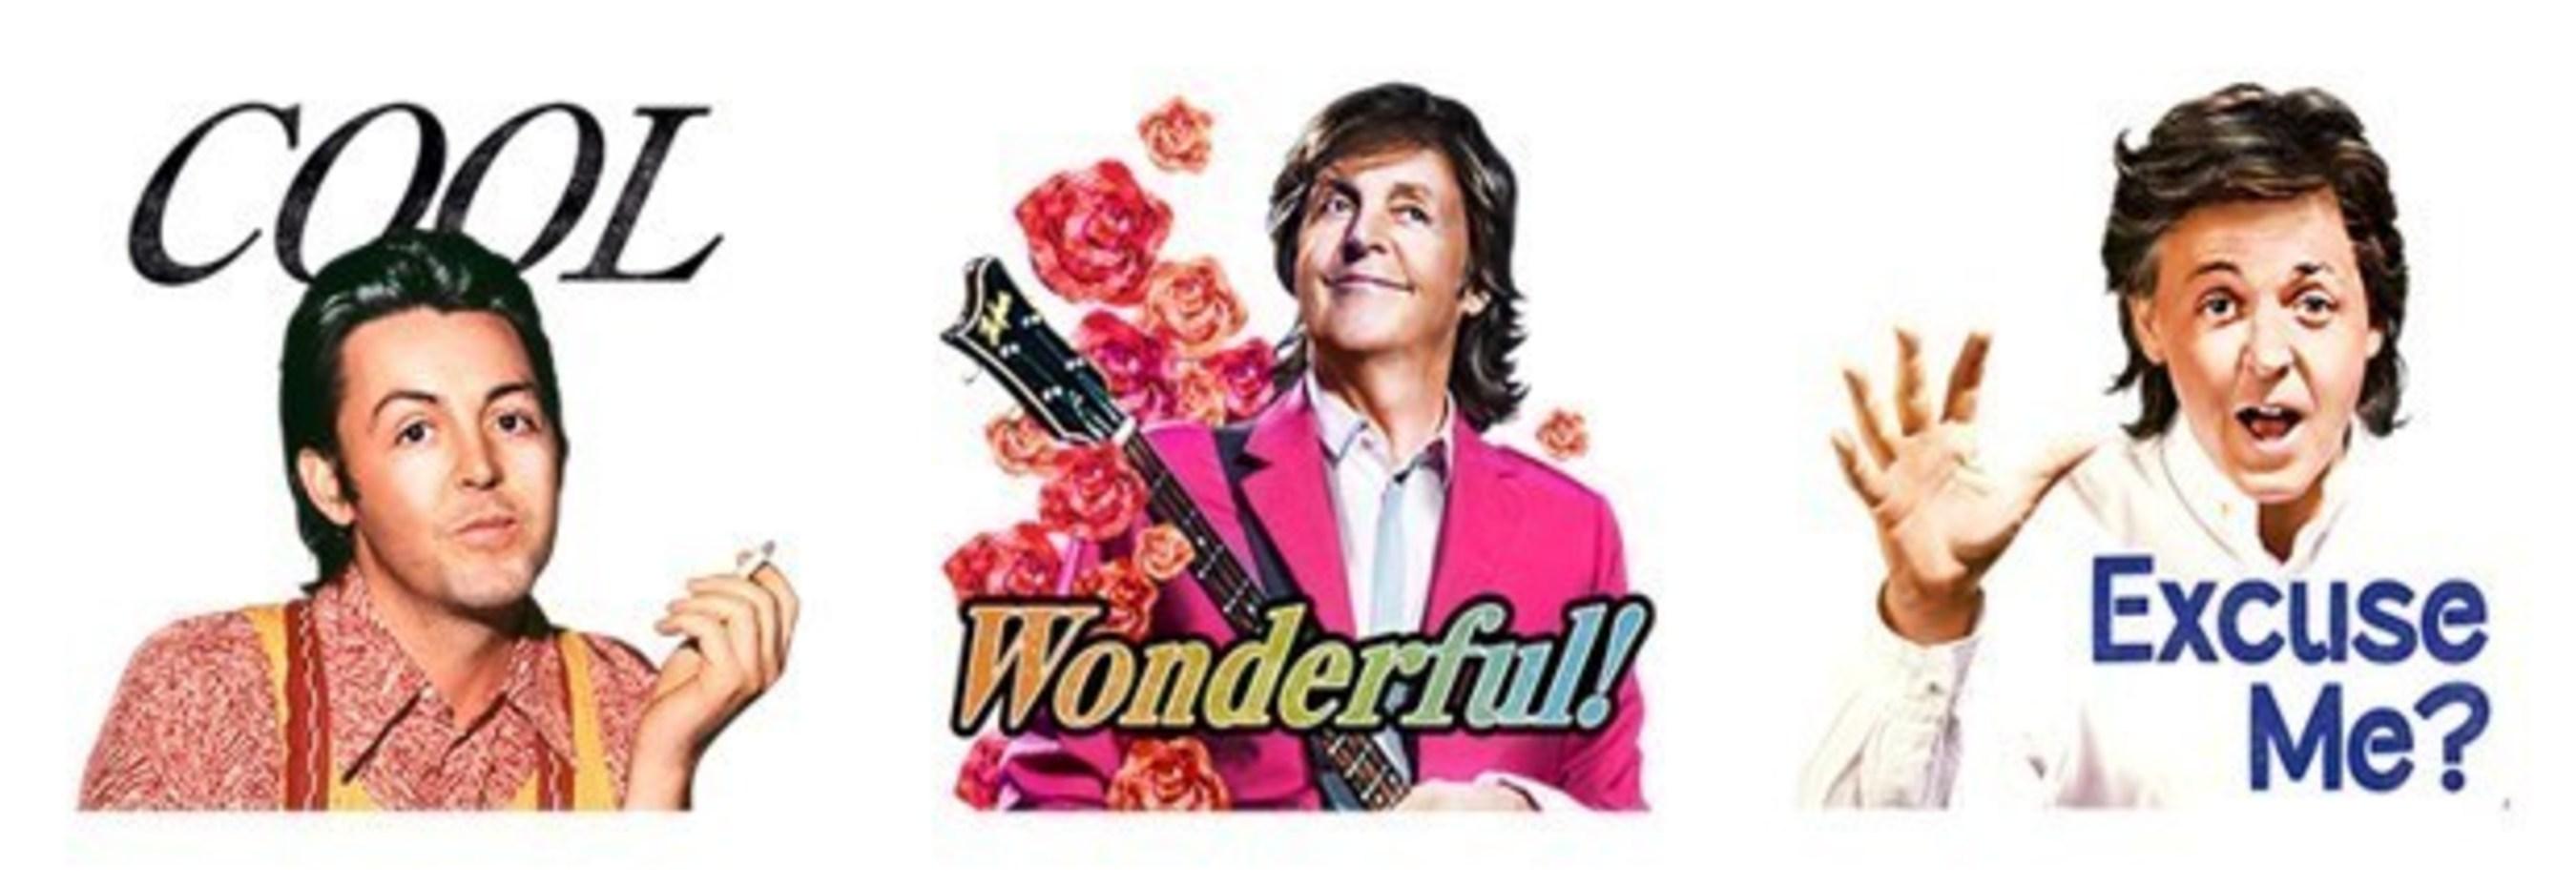 Paul McCartney Sound LINE Stickers